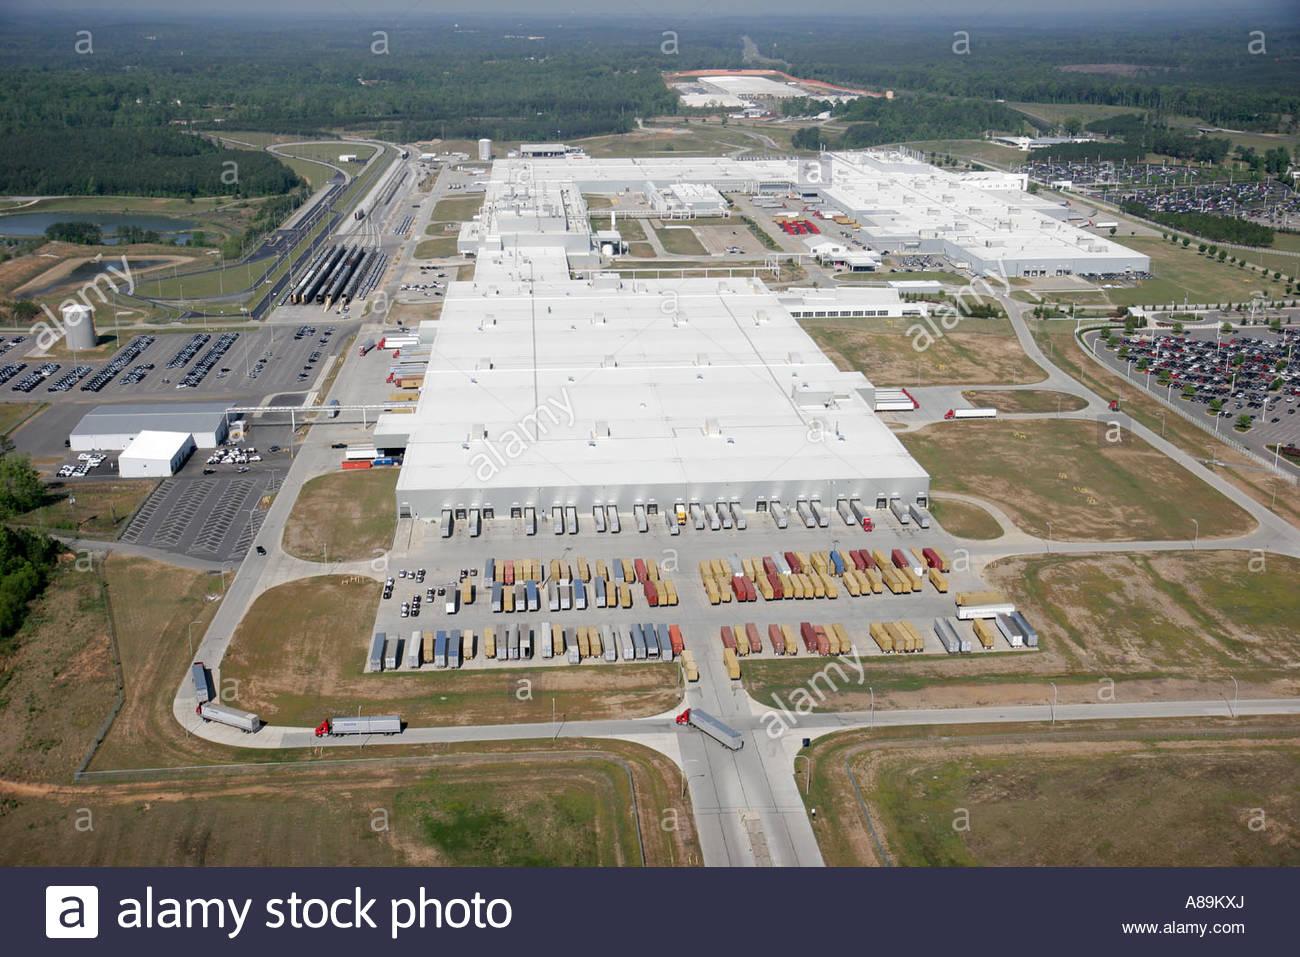 Alabama Vance Mercedes Benz German SUV manufacturing plant ...